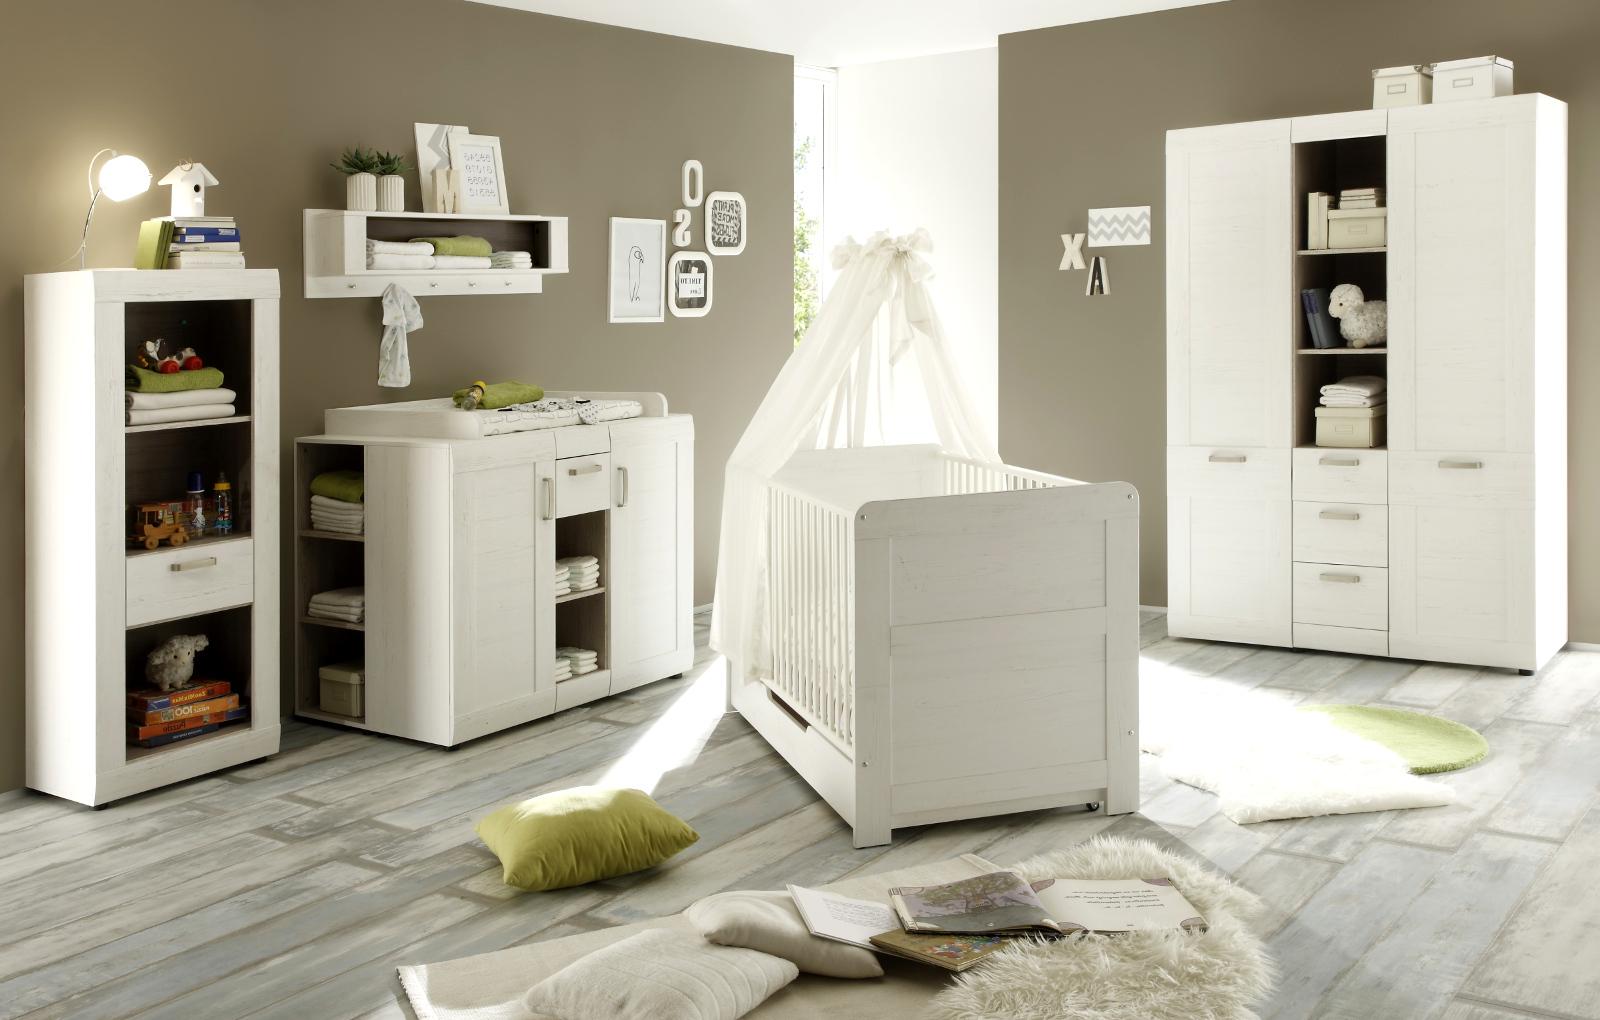 babyzimmer wei set olivia kinderzimmer in weiss 3 teilig. Black Bedroom Furniture Sets. Home Design Ideas